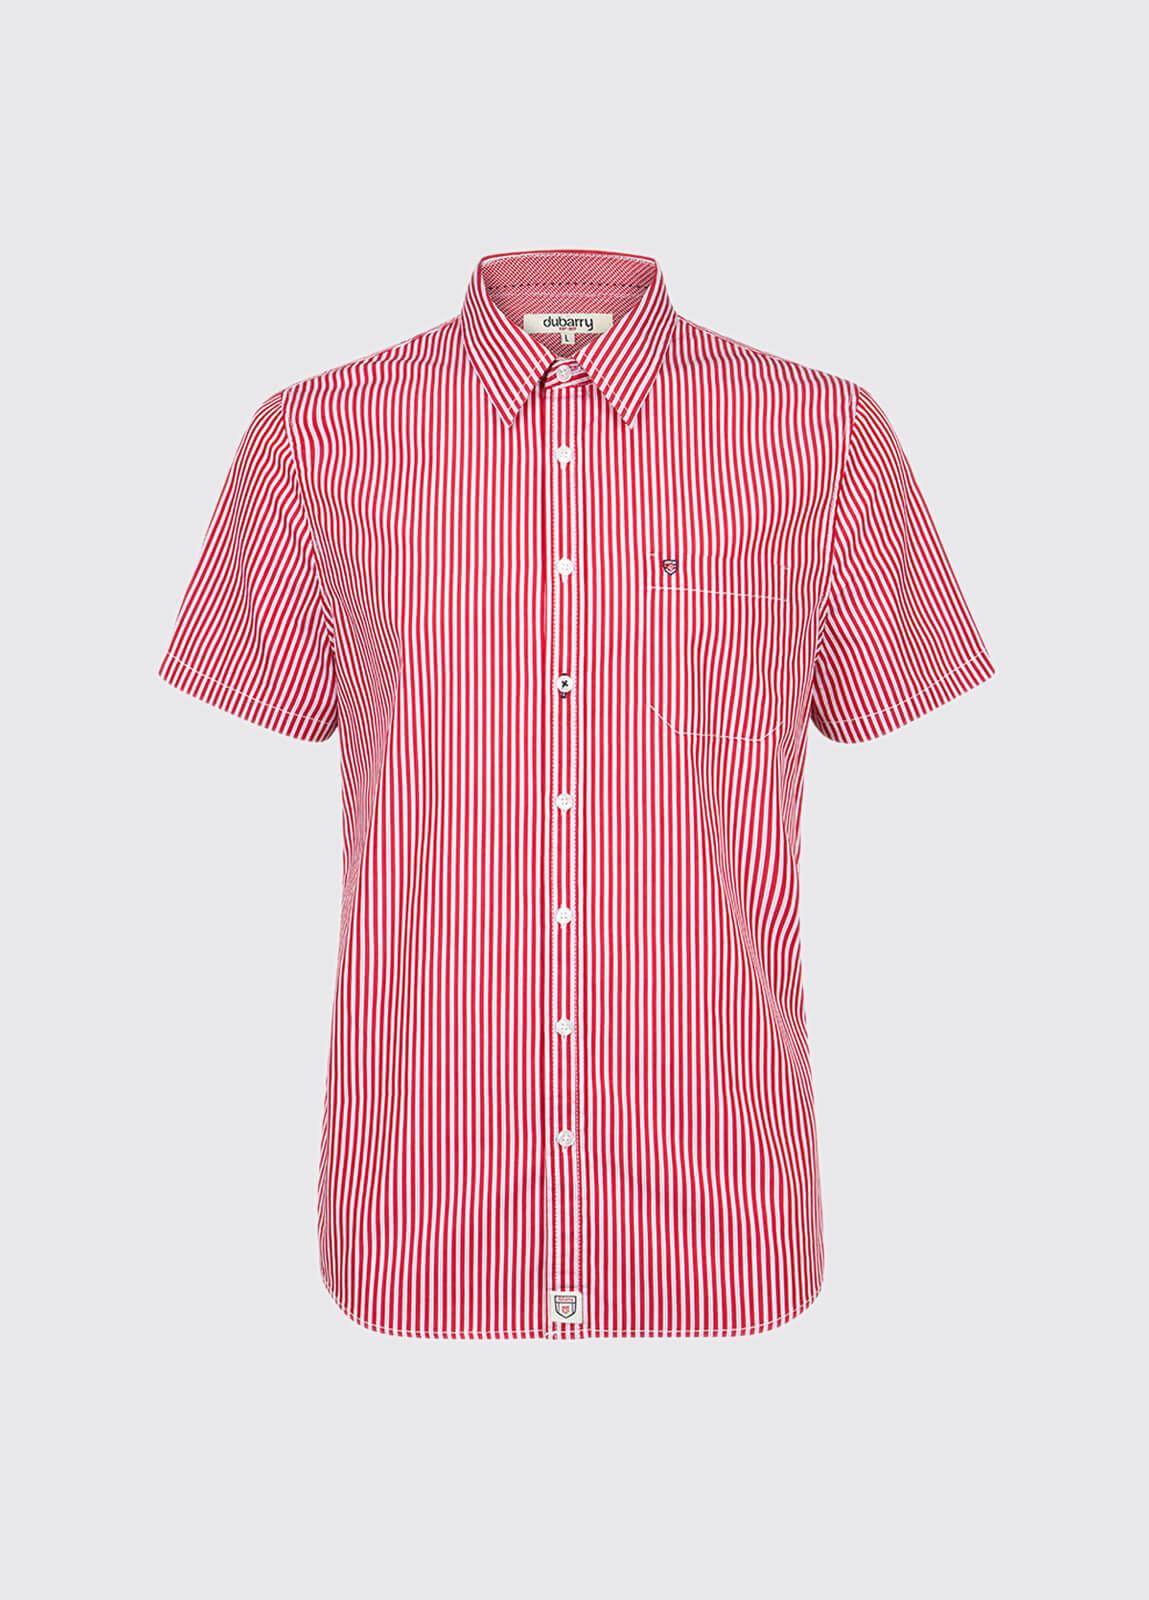 Blackrock Short-Sleeved Striped Shirt - Red Multi